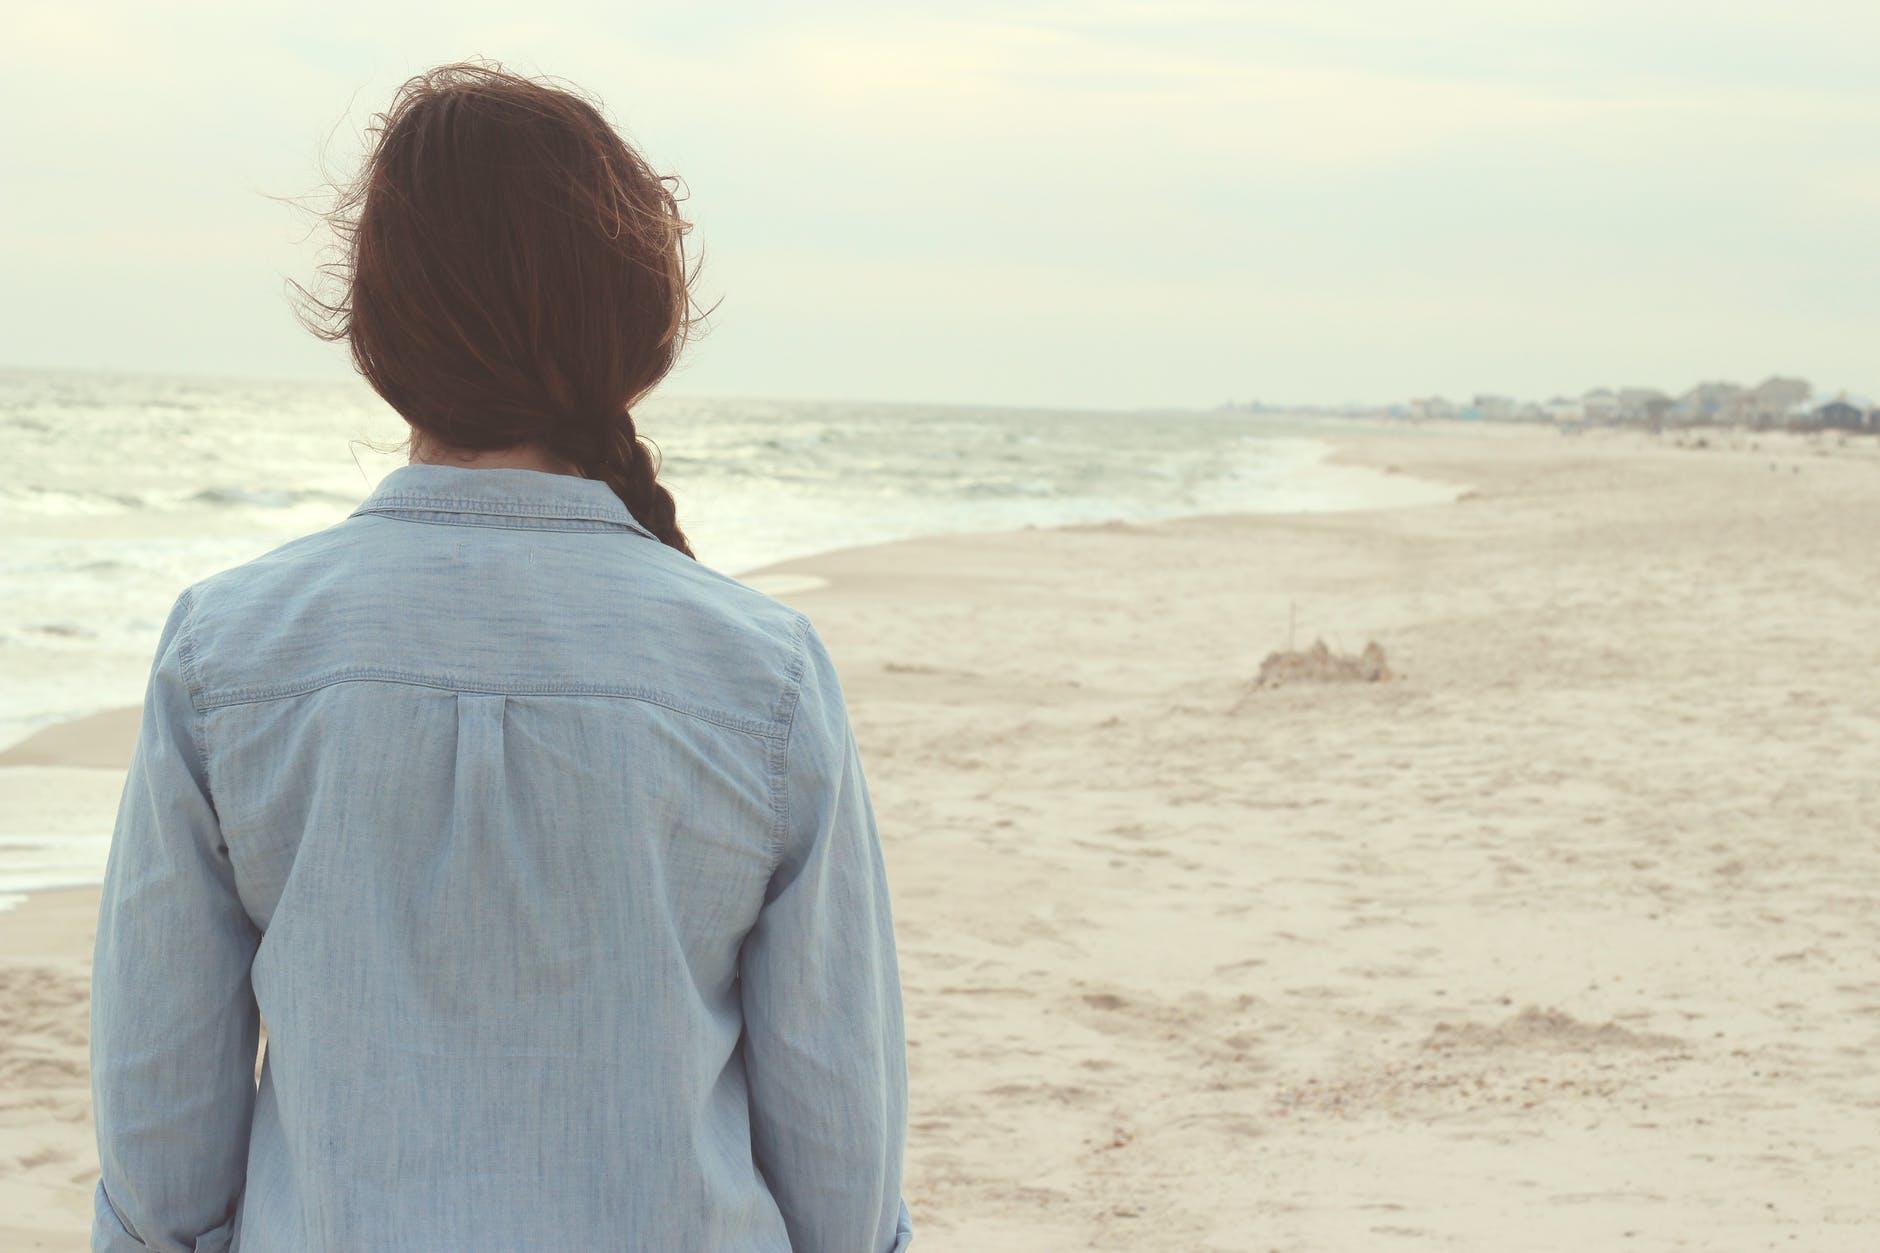 alone back beach girl